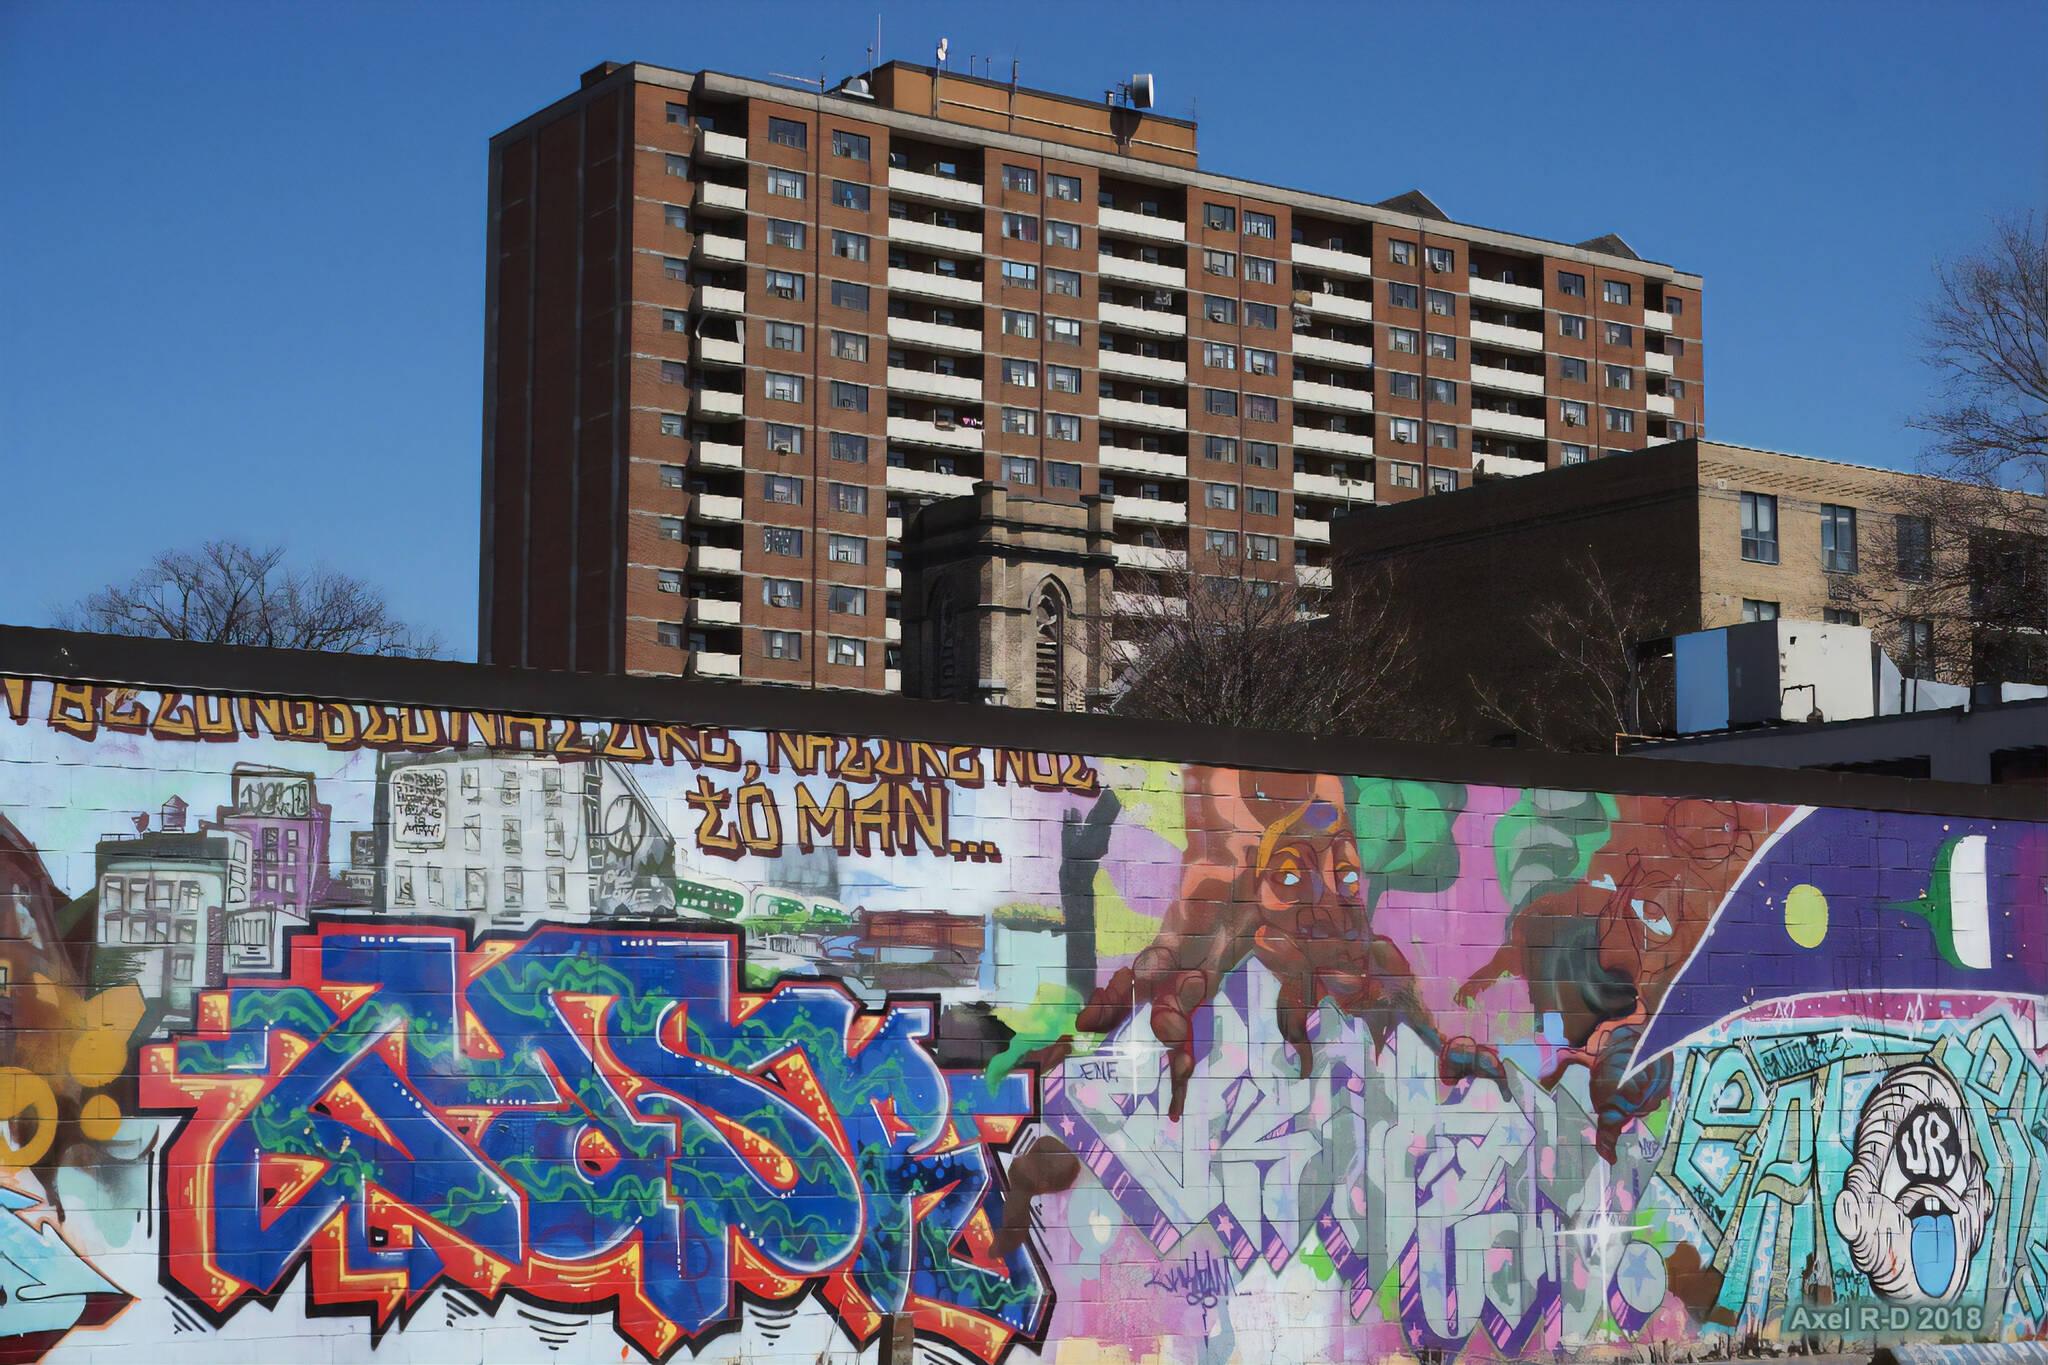 Toronto renovictions